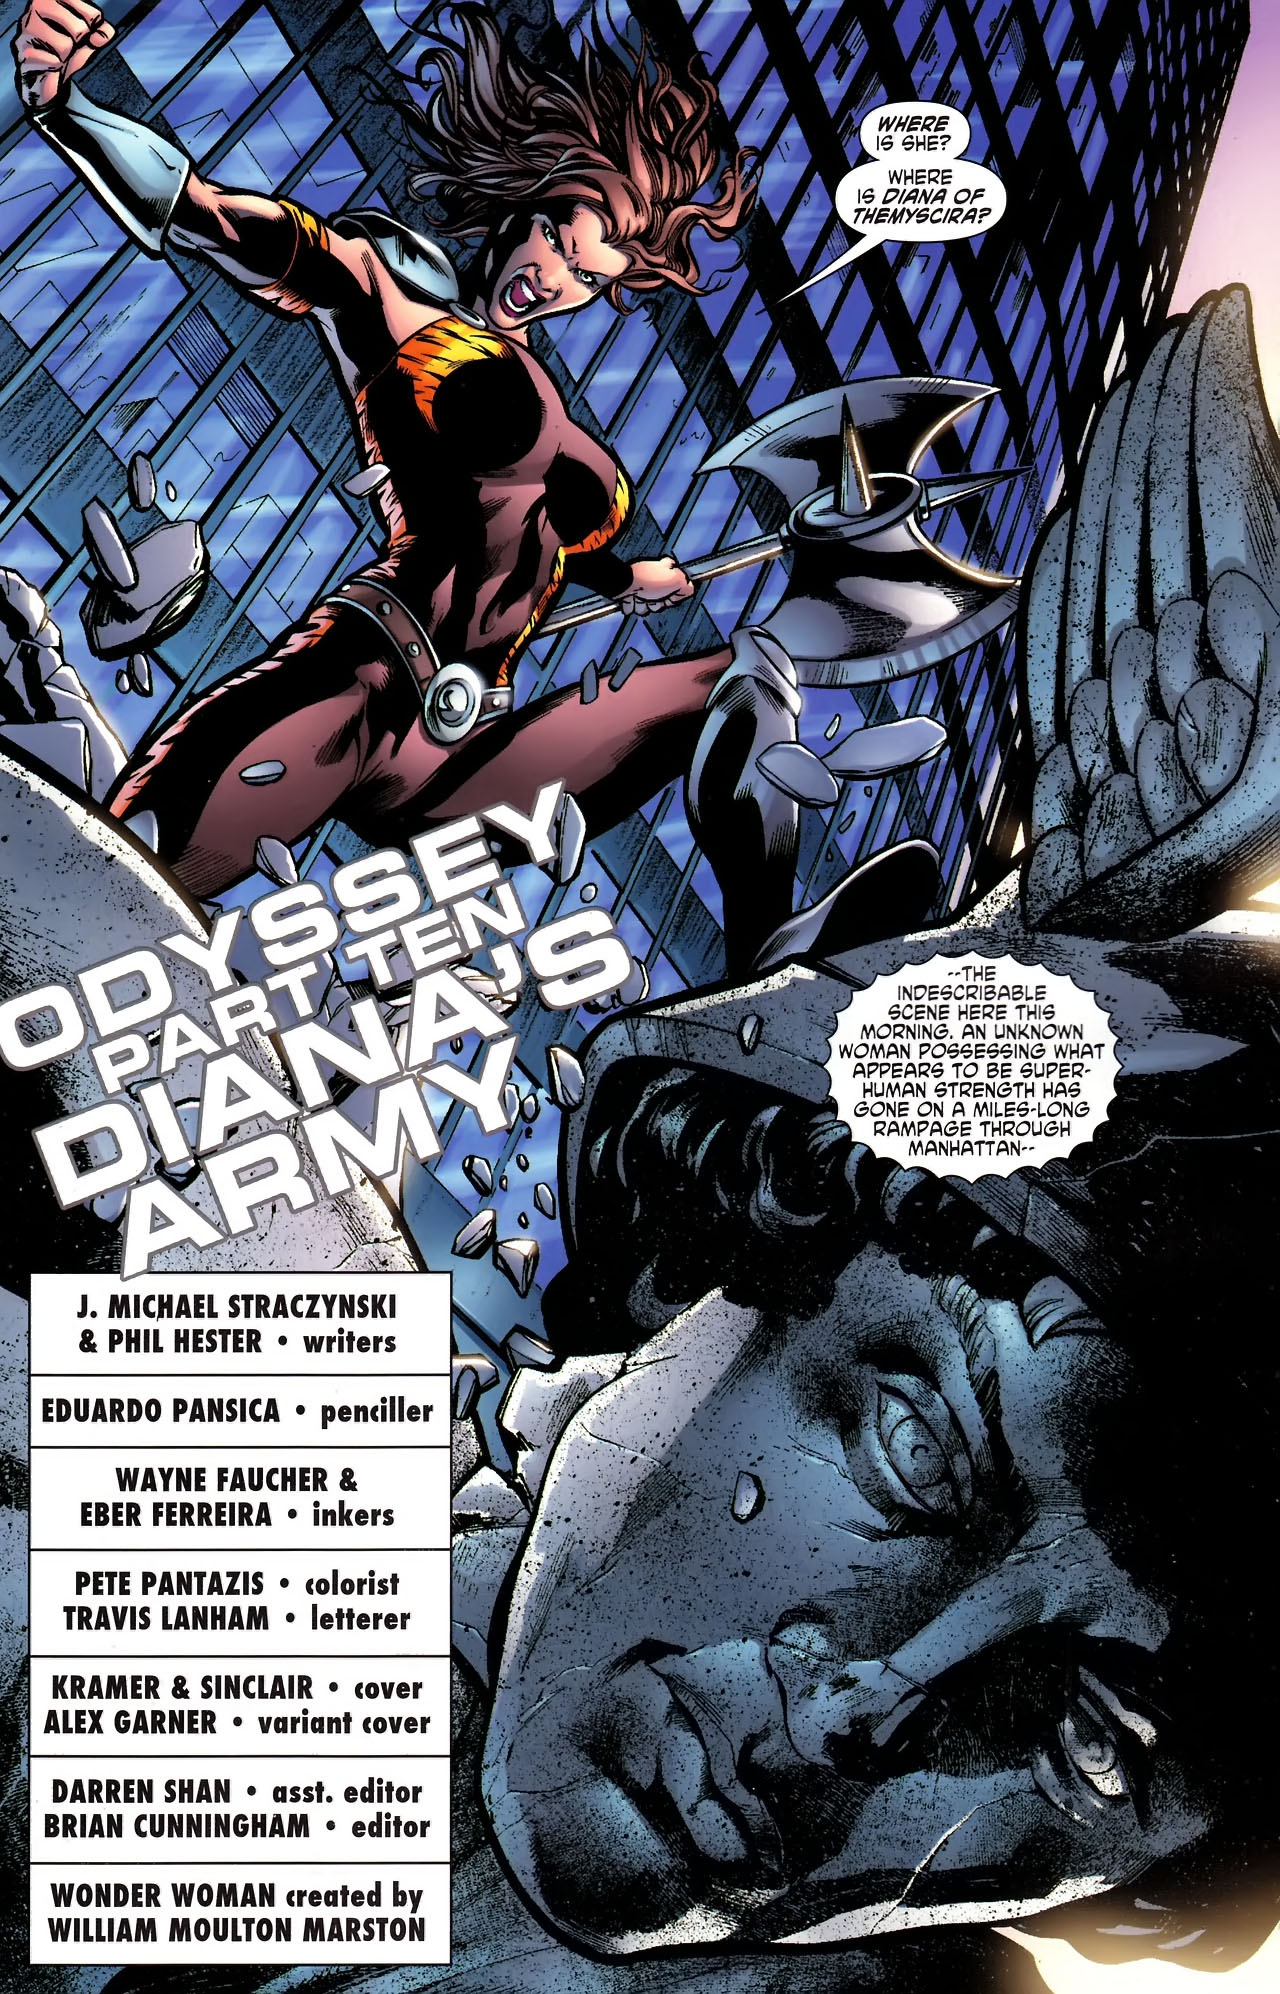 Read online Wonder Woman (2006) comic -  Issue #610 - 2